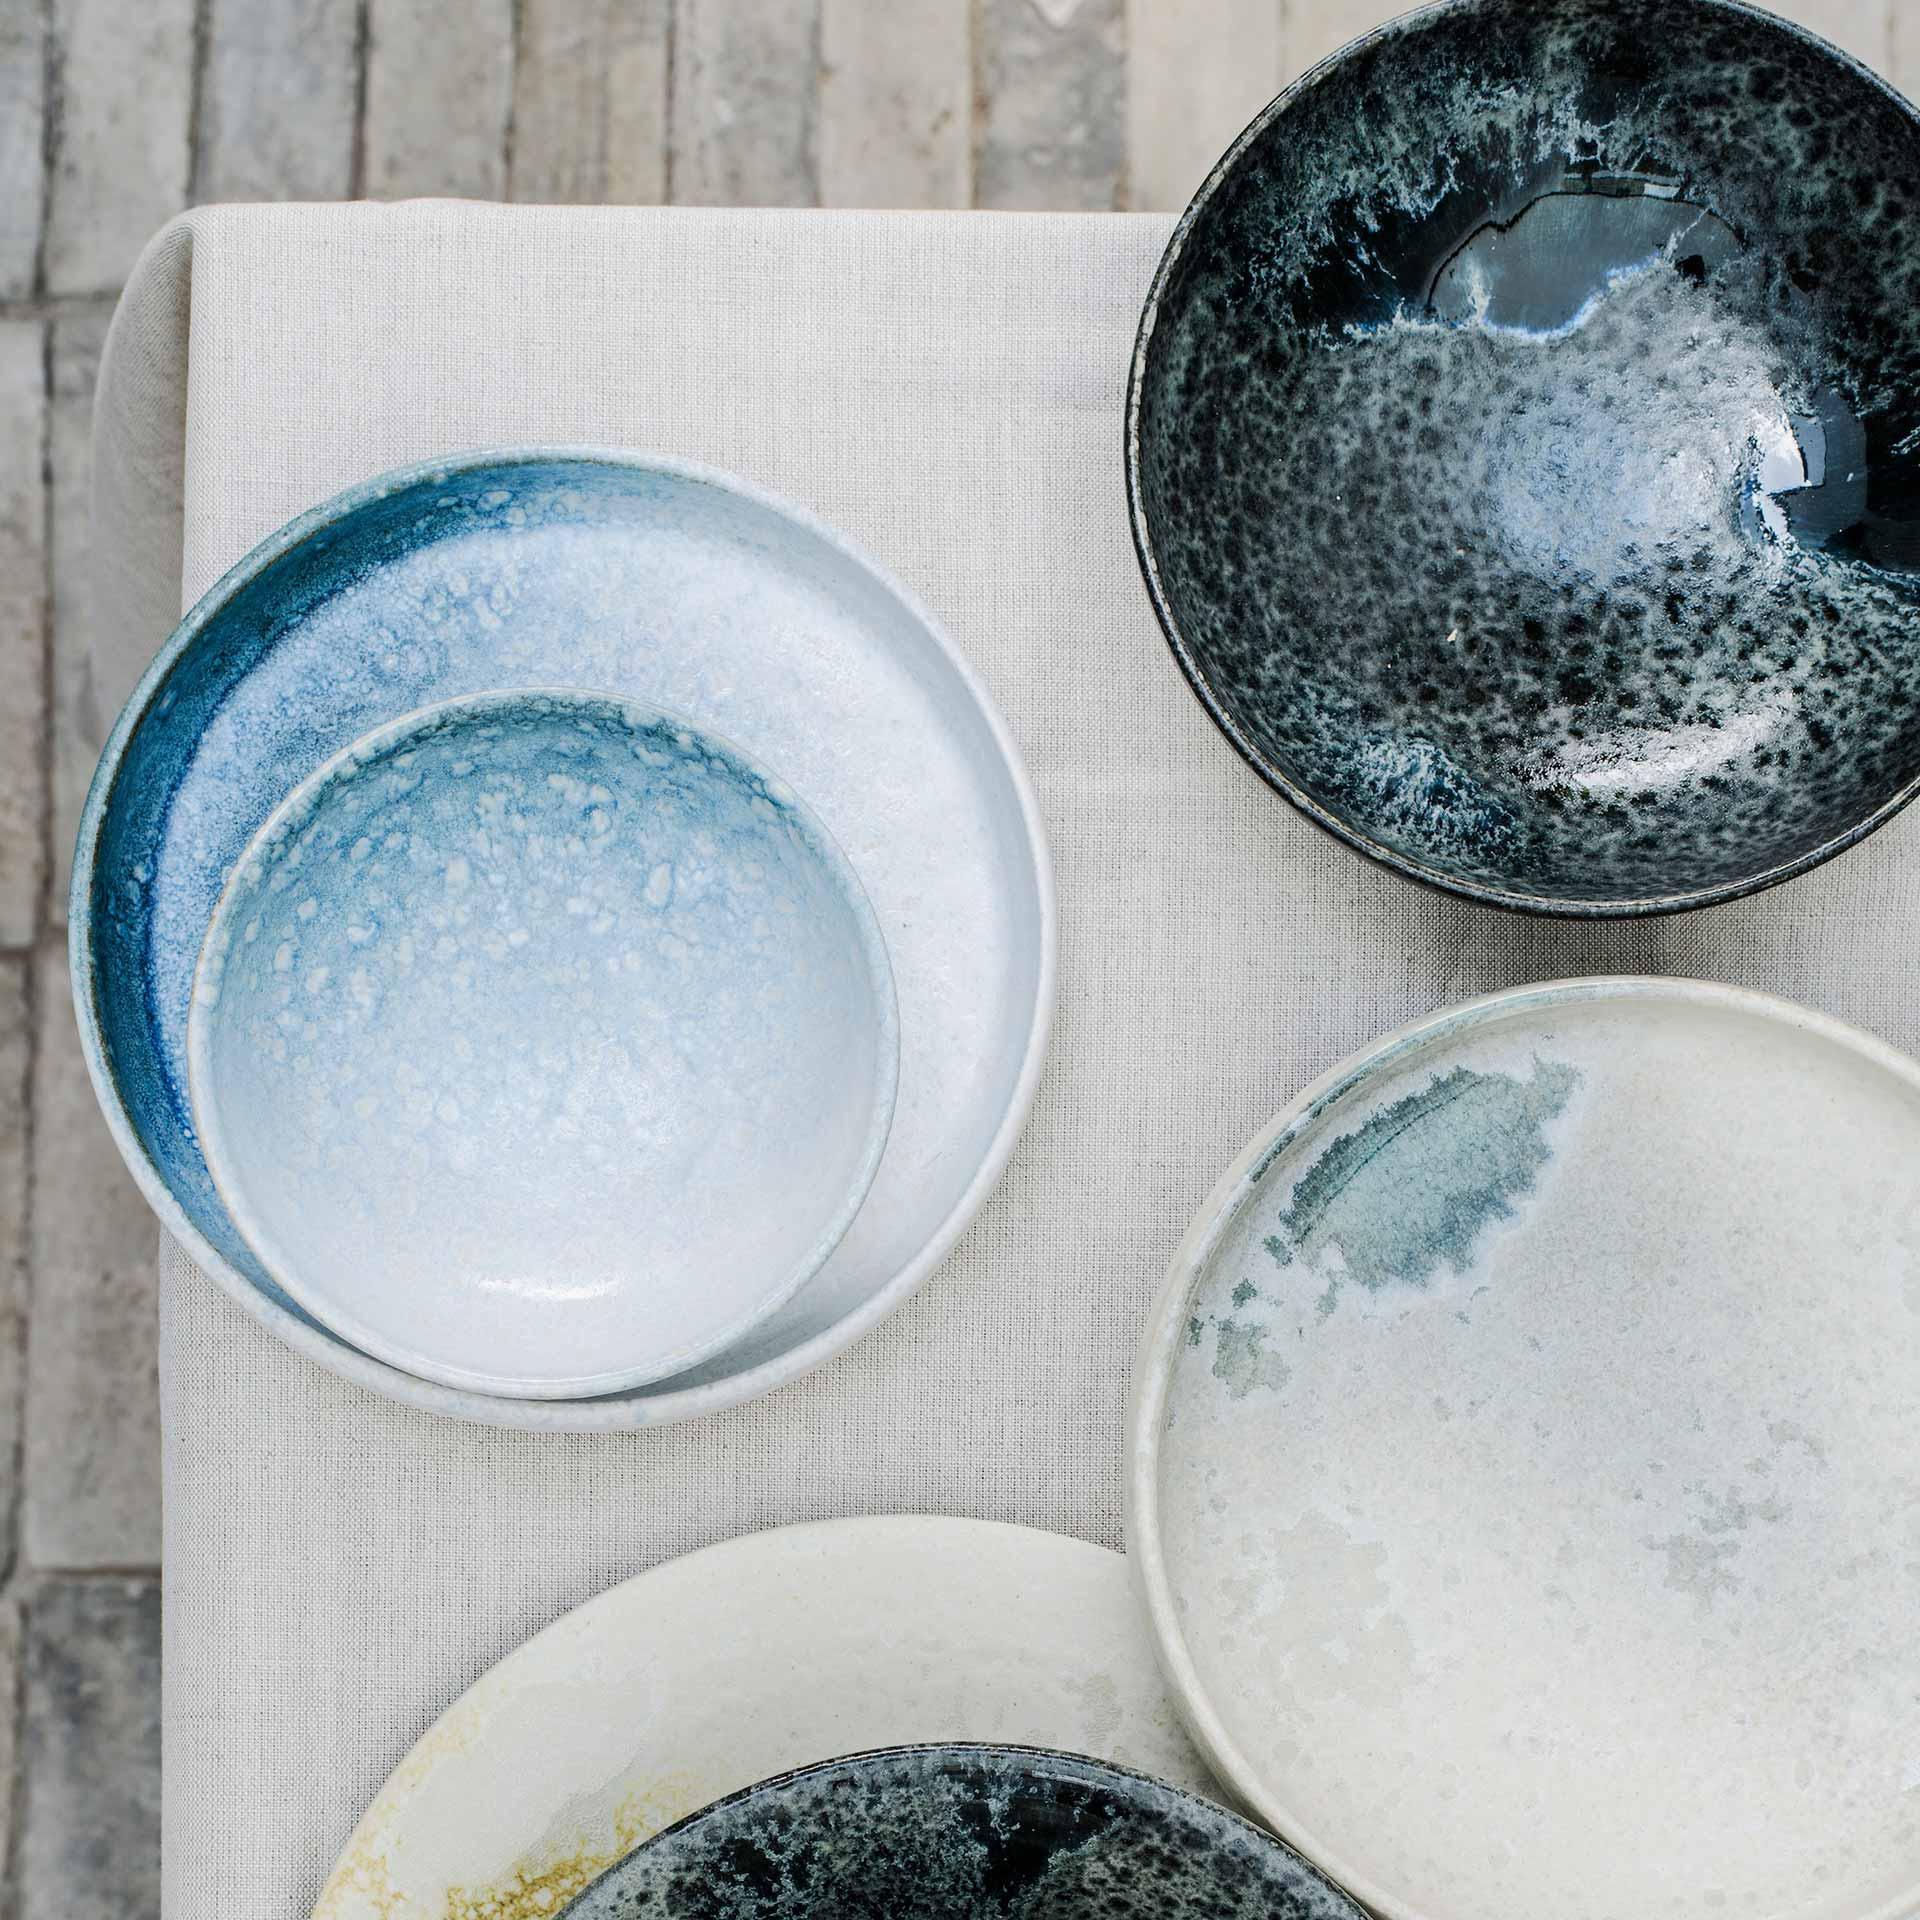 khw rtz   new nordic ceramics and pottery design